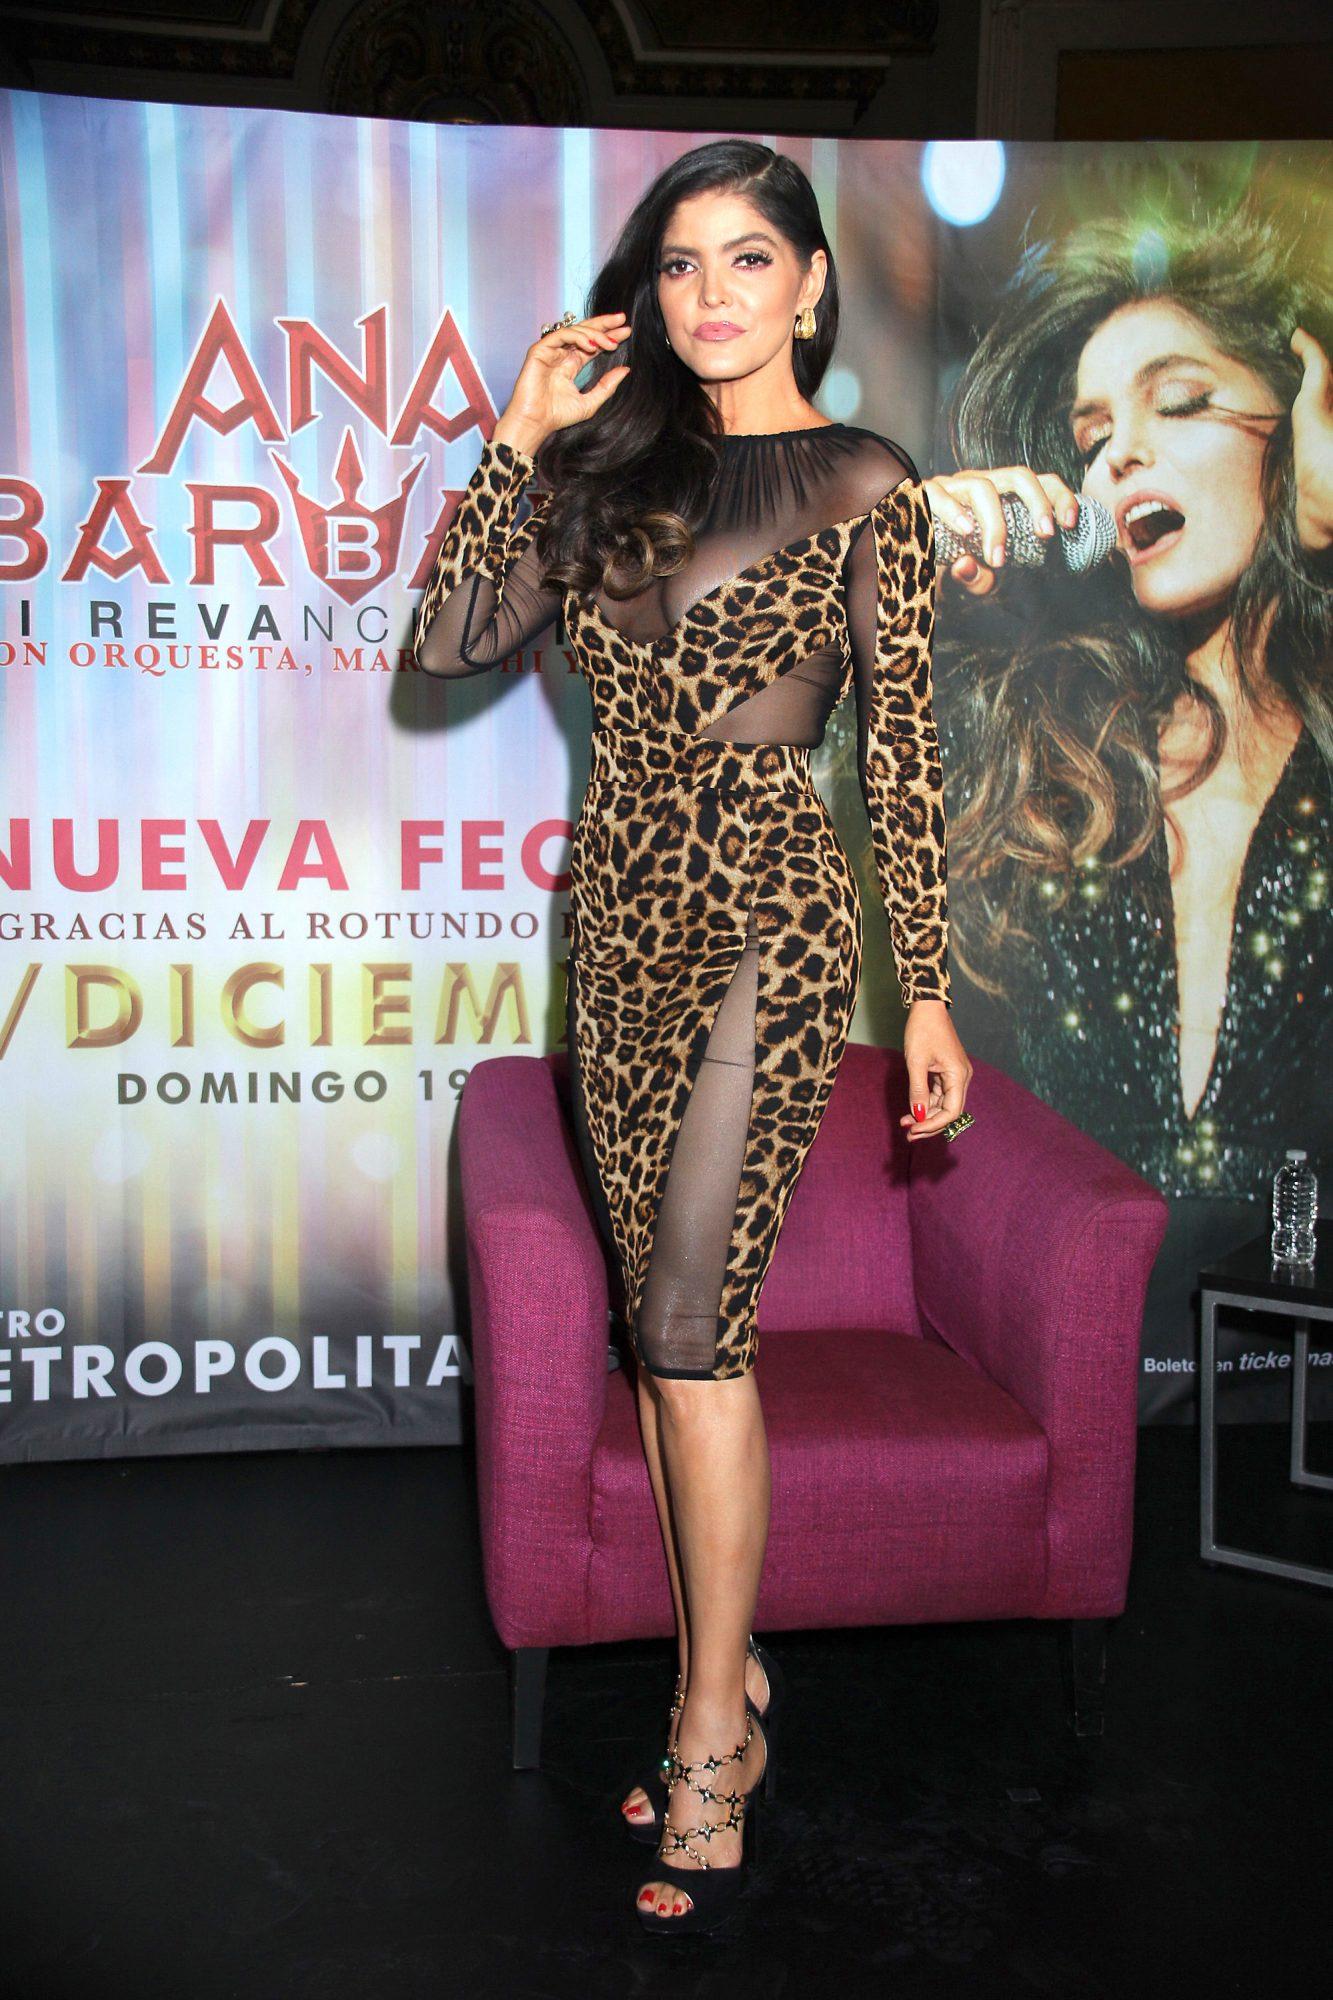 Ana Bárbara Revancha Tour